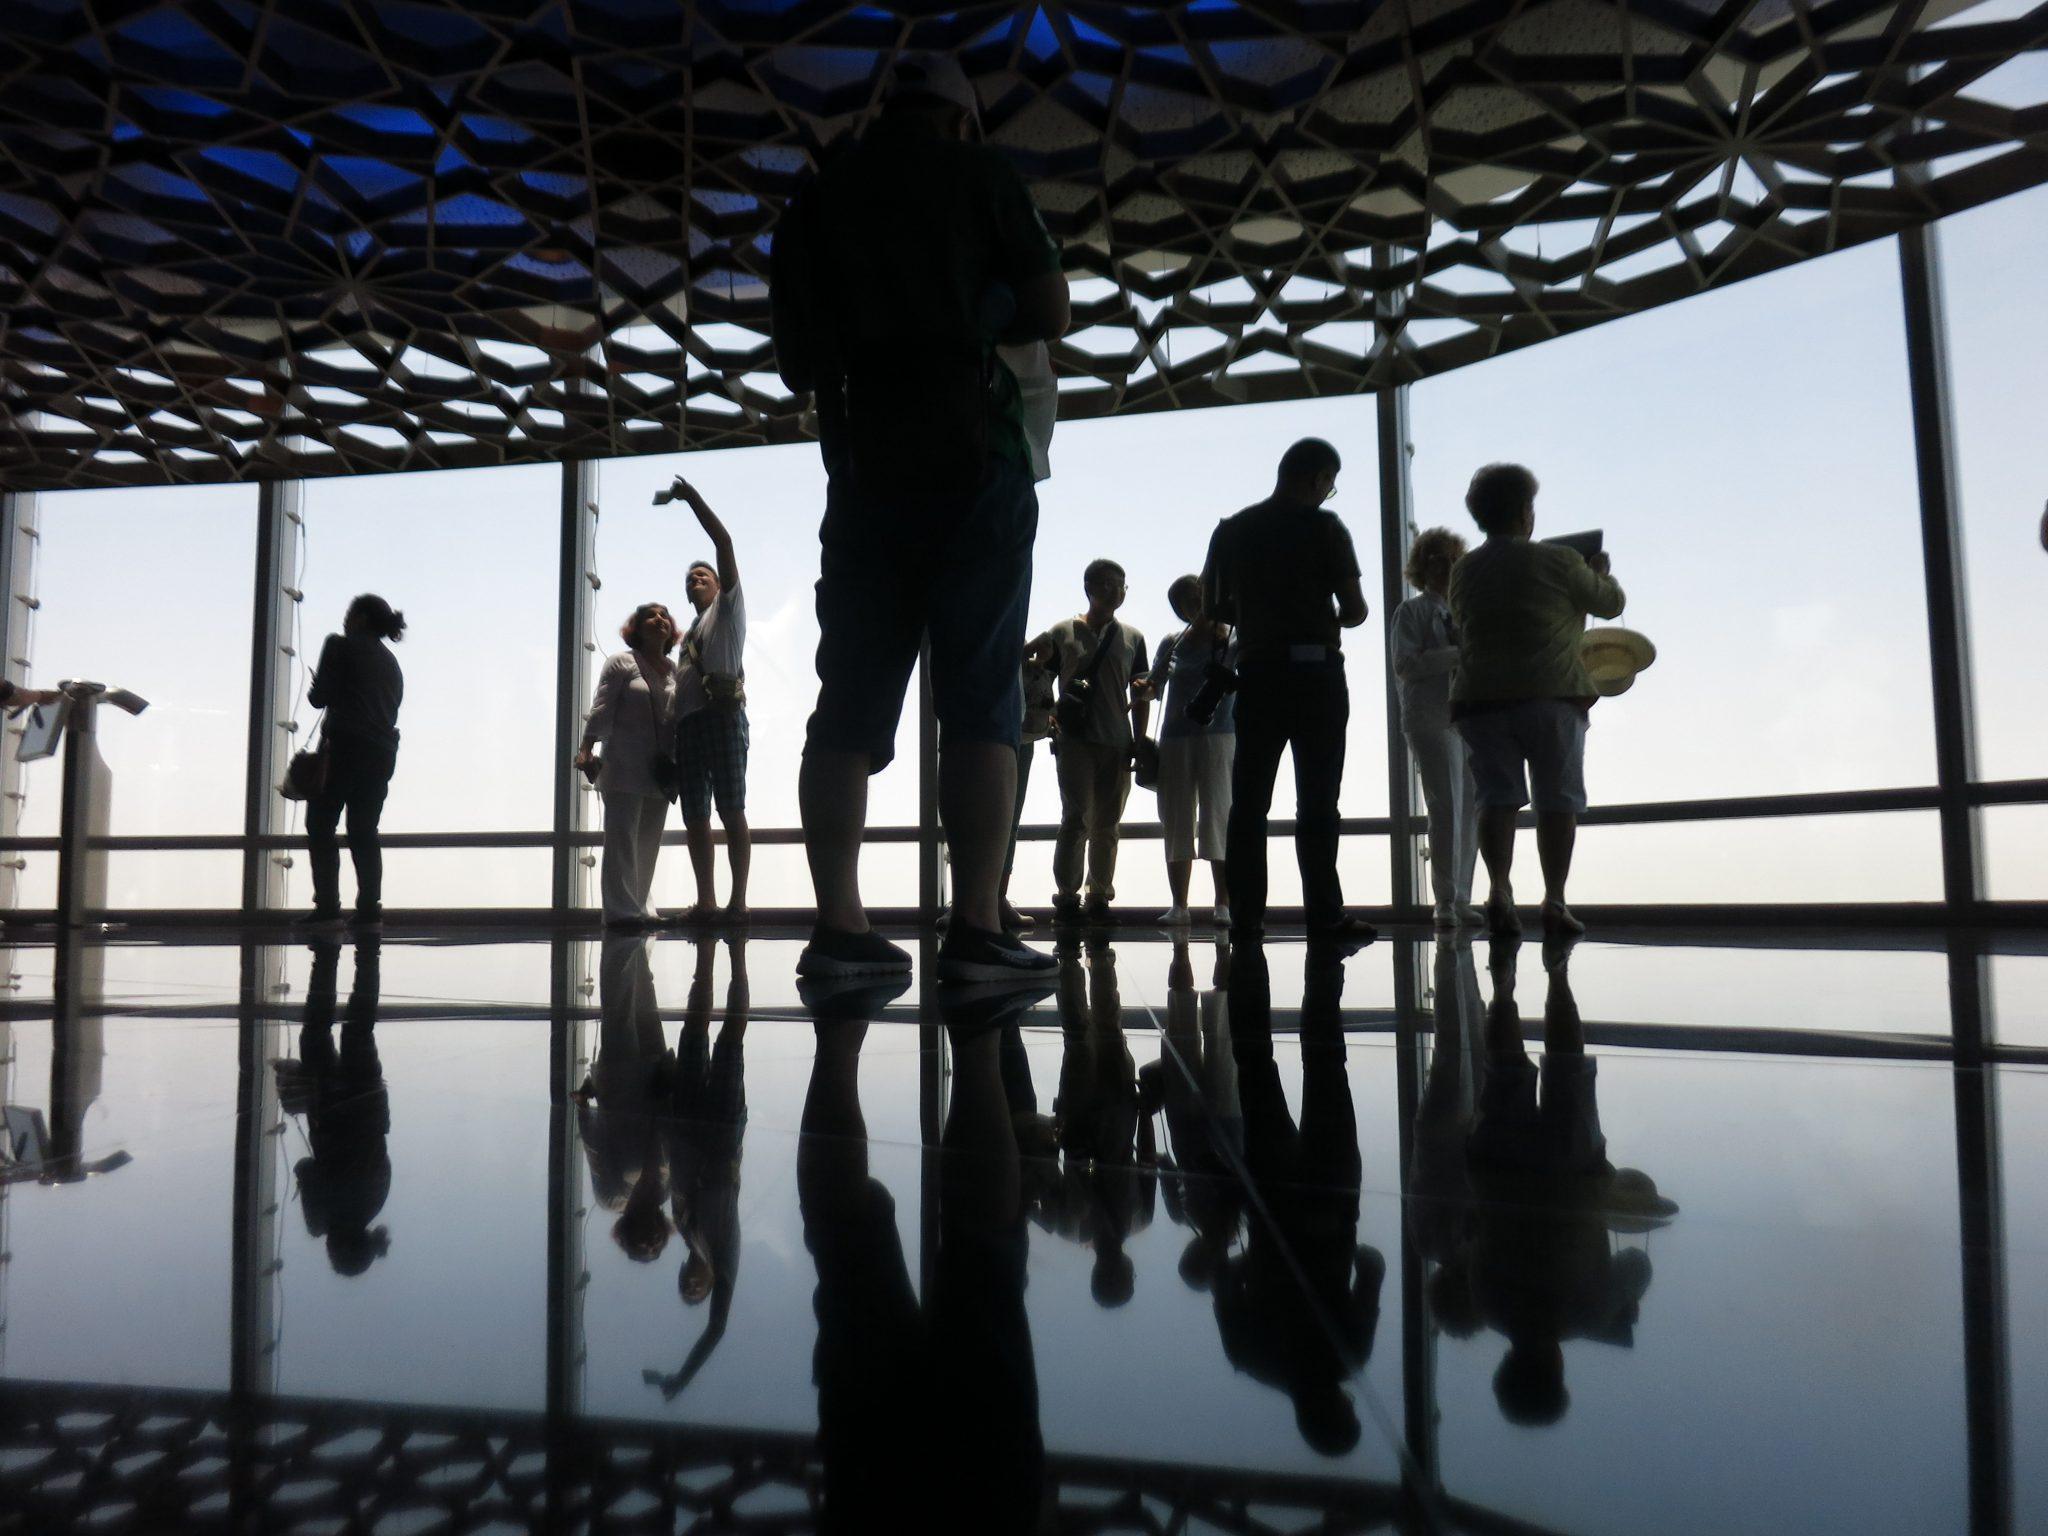 Tourists on the 125th floor of Burj Khalifa